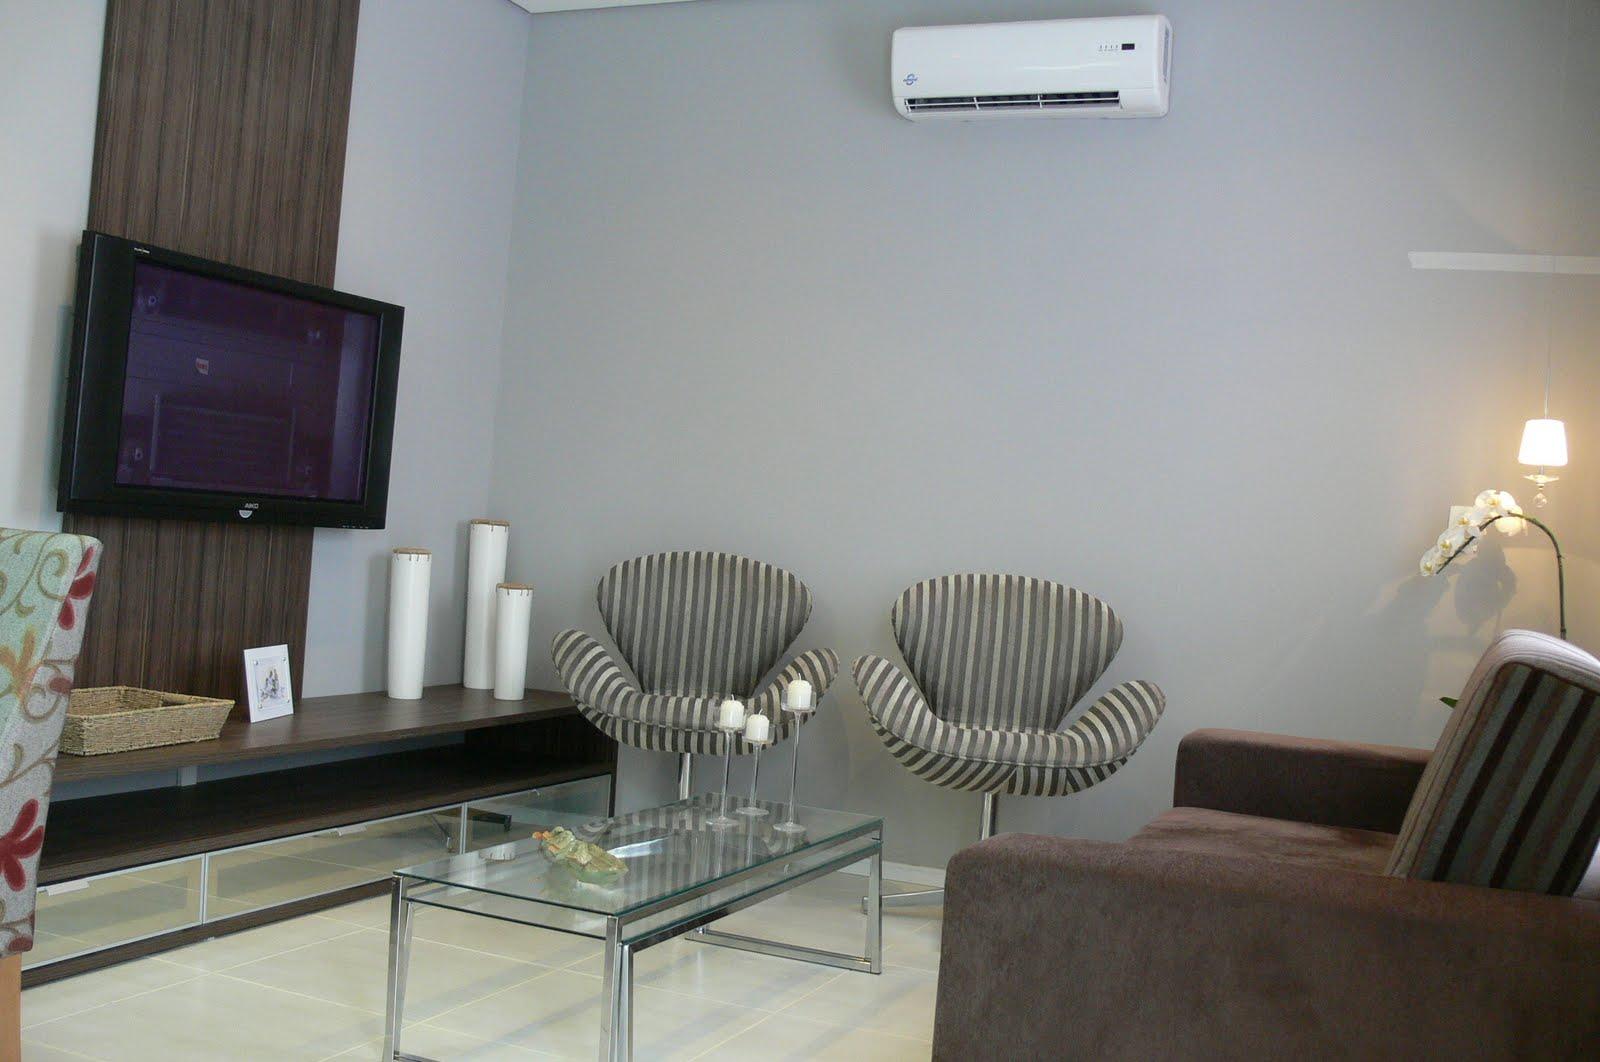 #7E694D como decorar a sala de tv simples Quotes 1600x1062 píxeis em Como Decorar Sala De Visita Simples